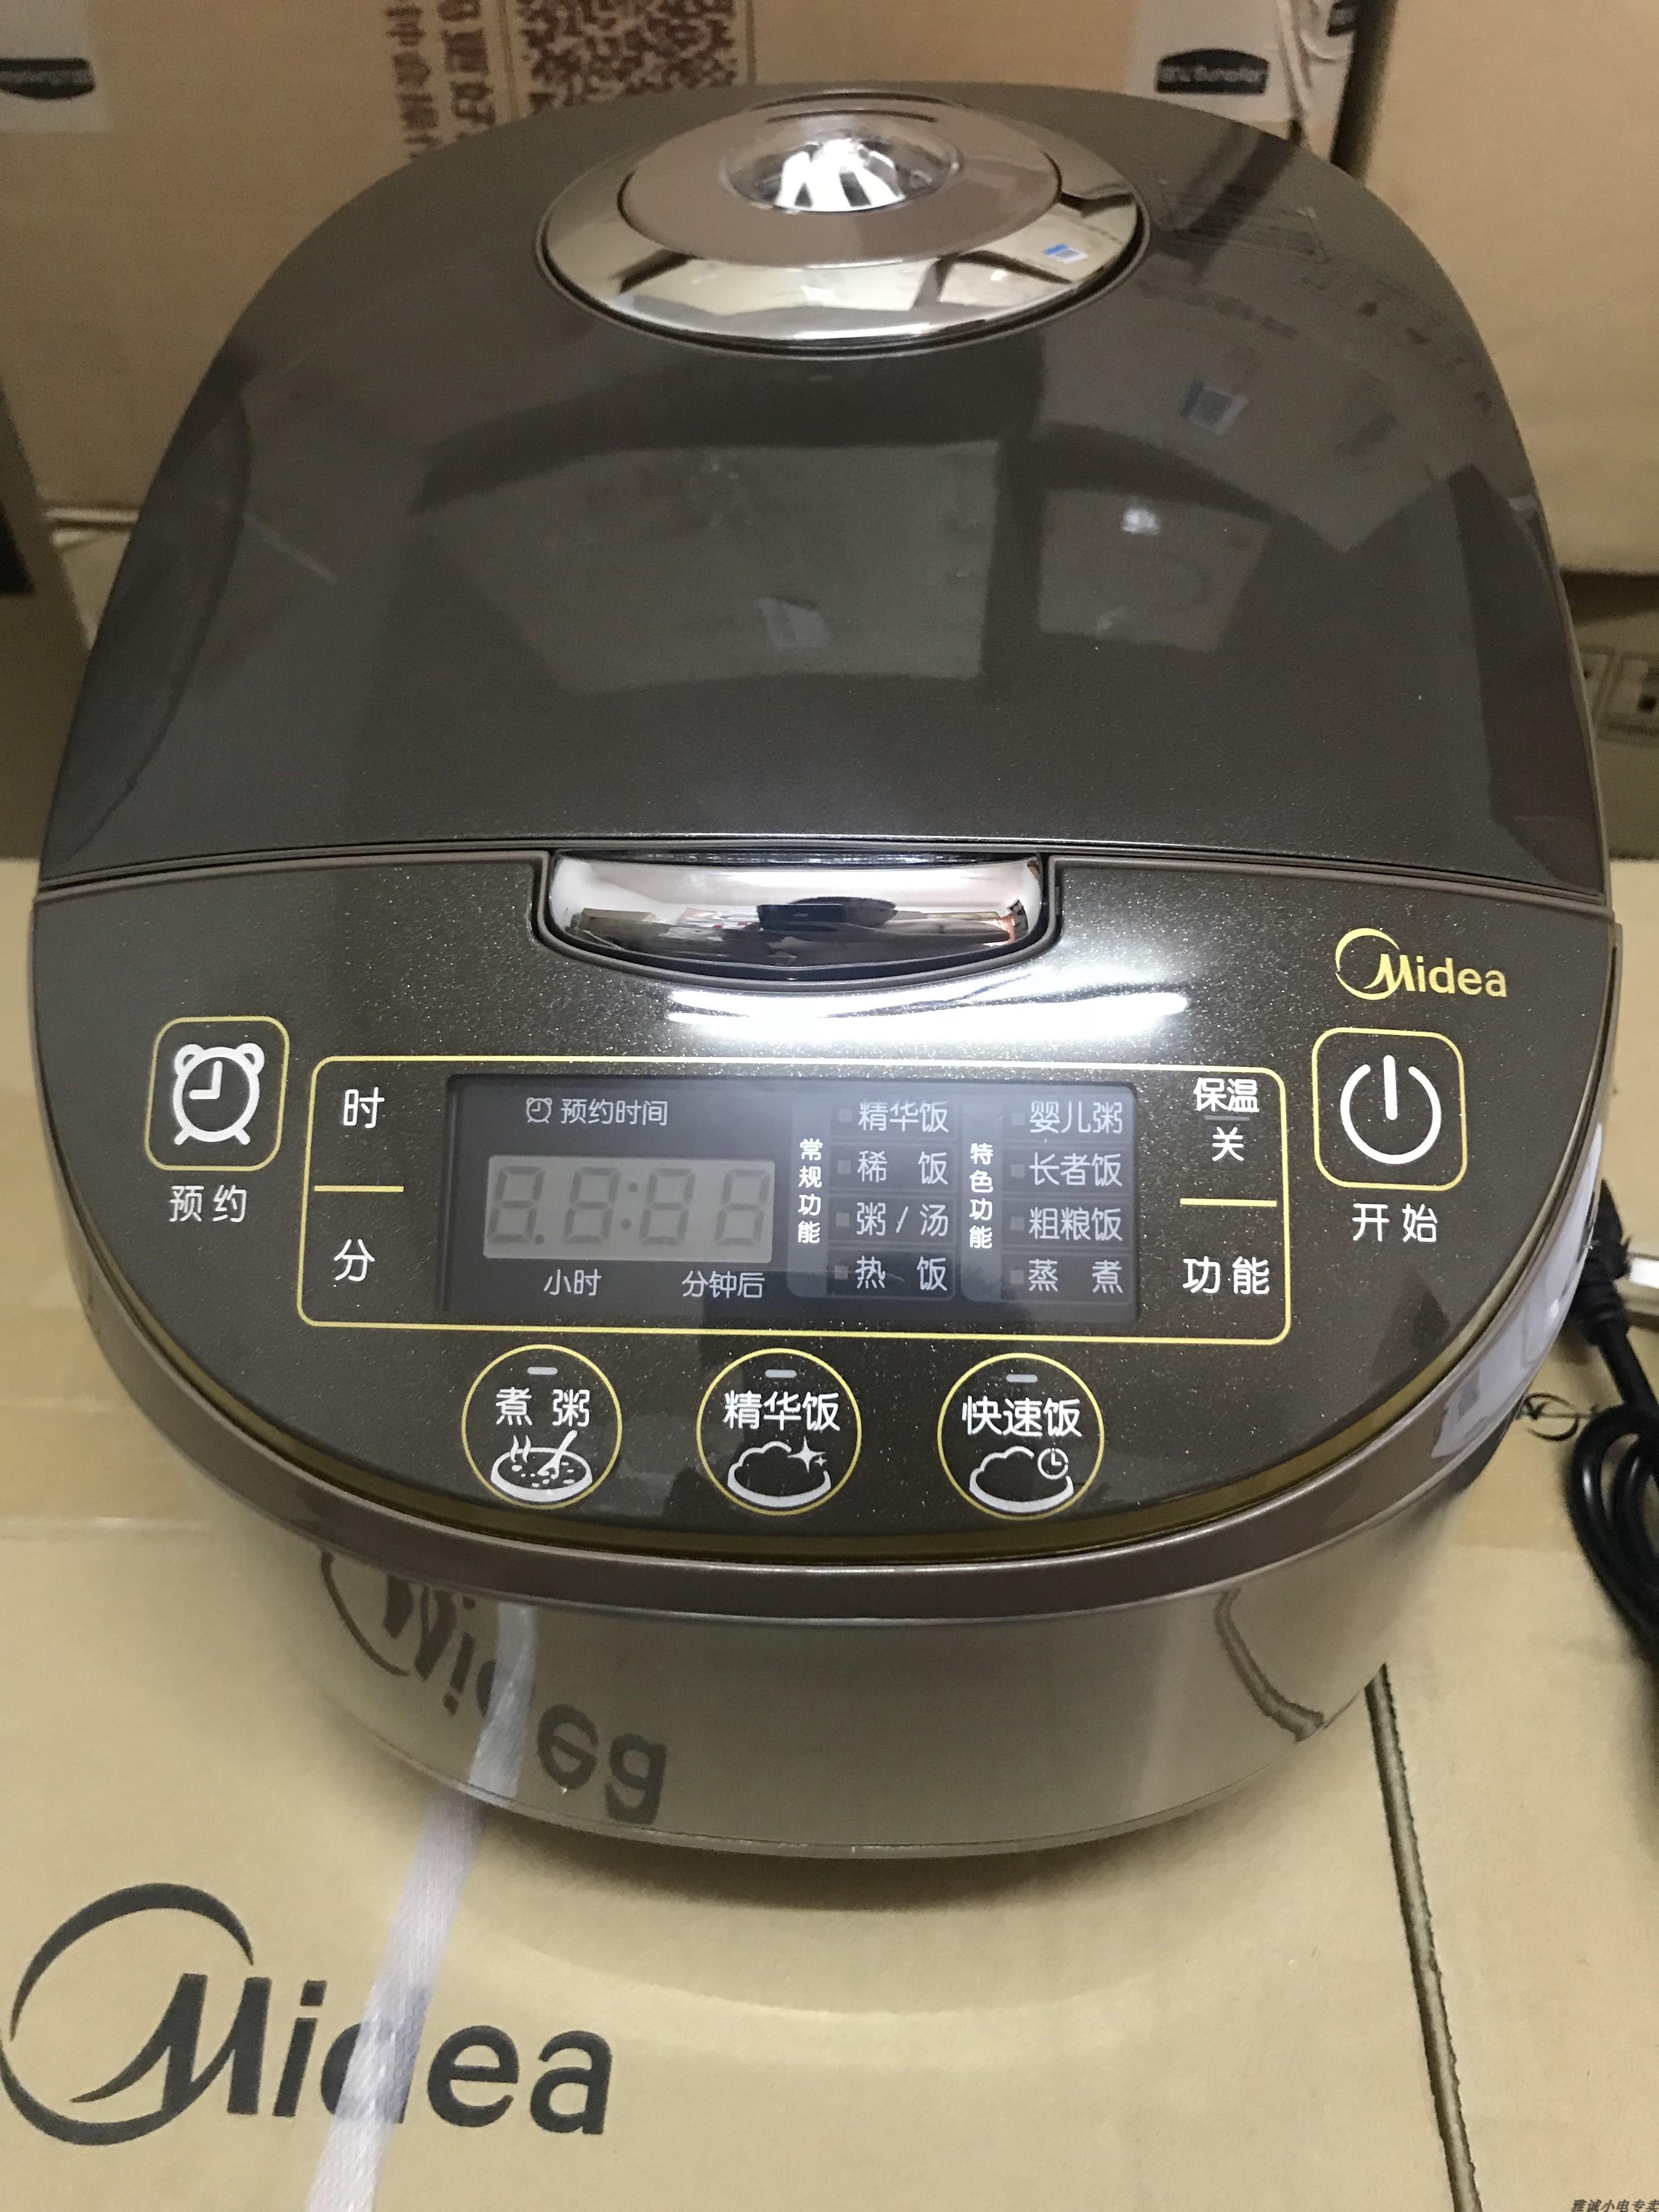 Midea/美的 MB-WFS5017TM 智能预约电饭煲5L聚能釜大容量正品联保